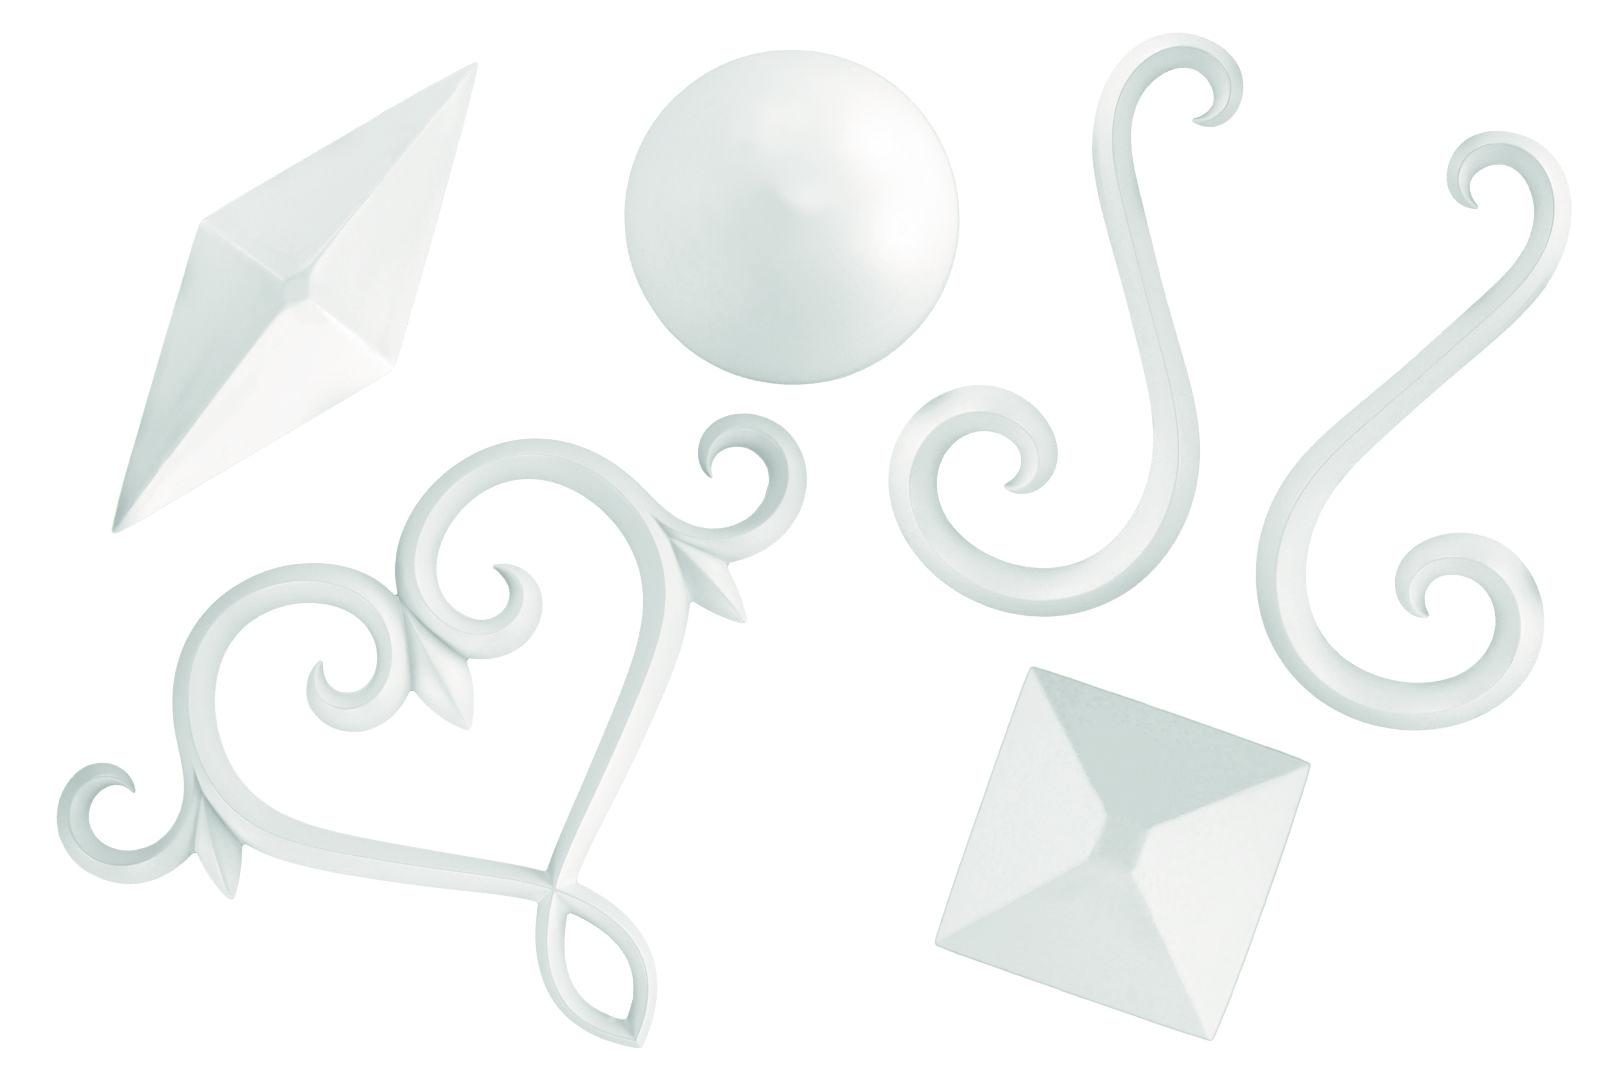 Segmente | Stuckdekor |Auswahl |PU | stoßfest |Grand Decor